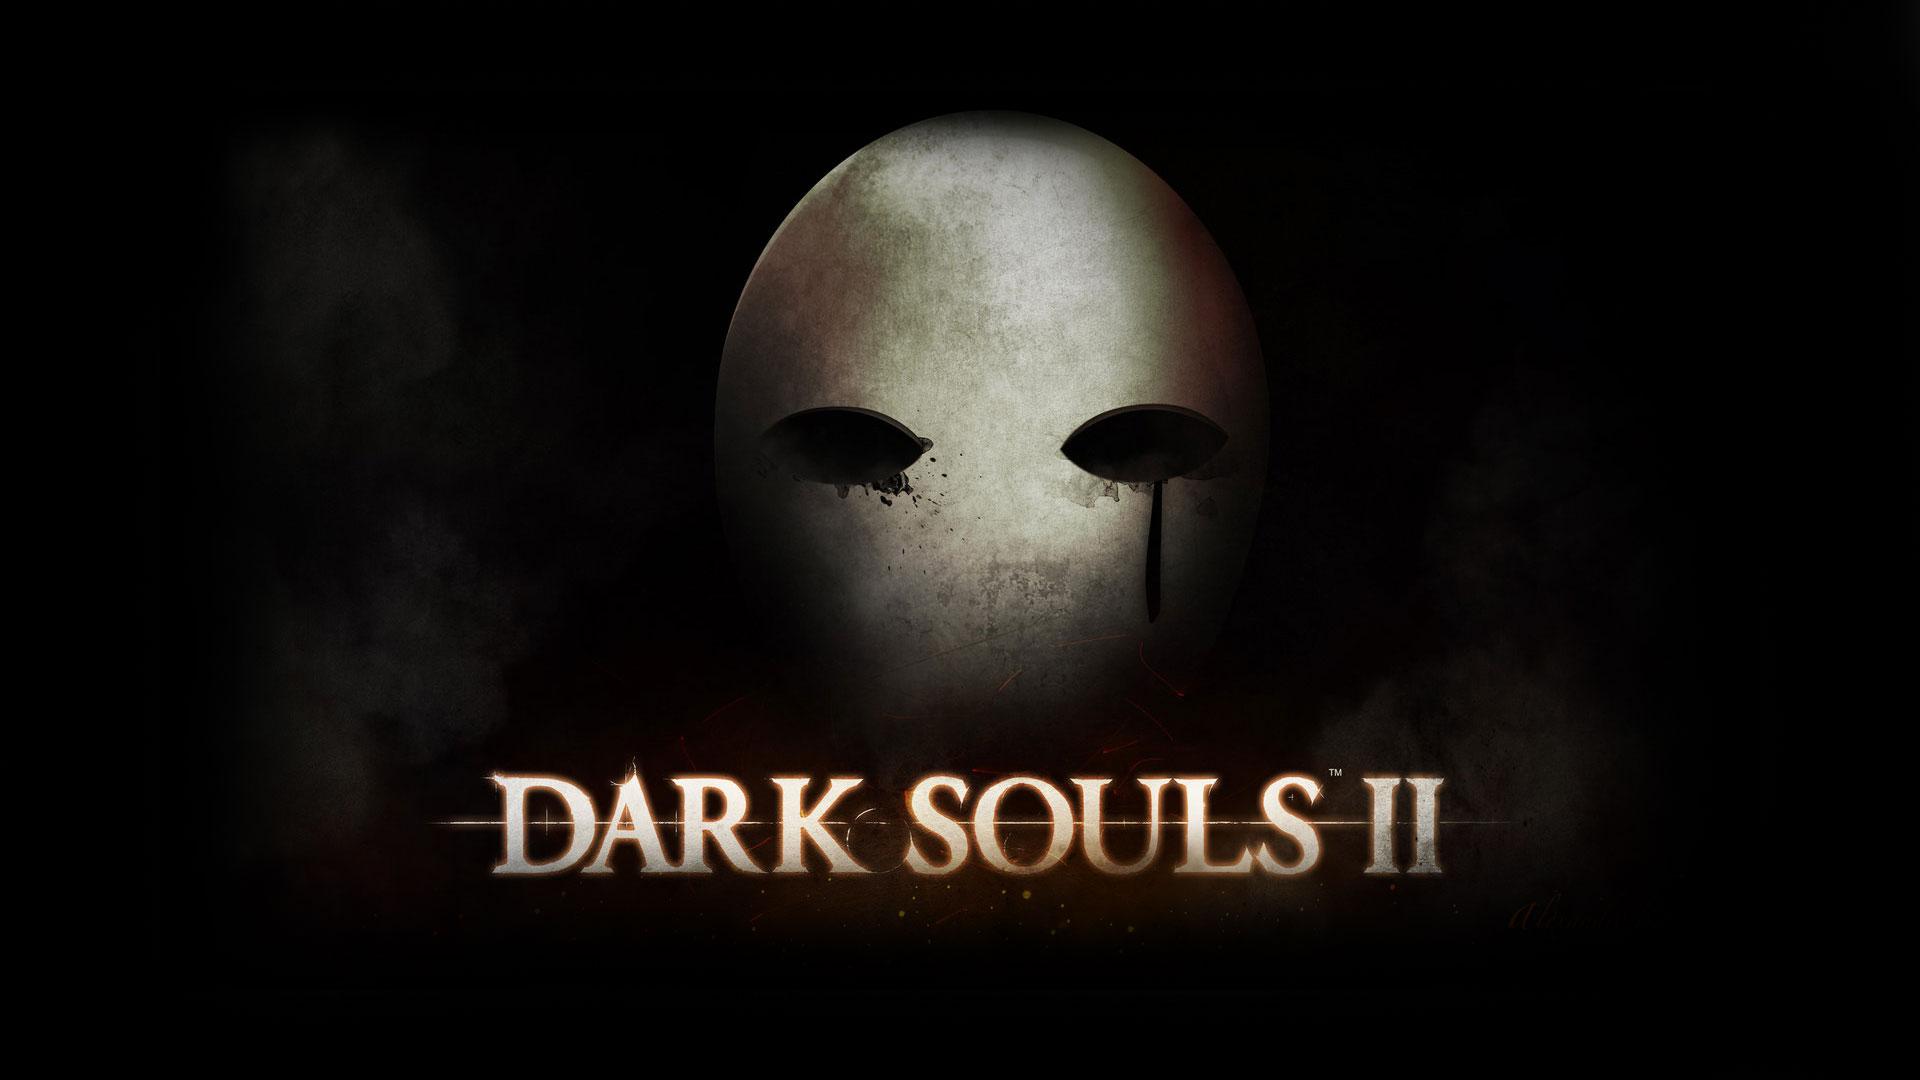 Dark Souls 2 Wallpapers HD Wallpapers 1920x1080